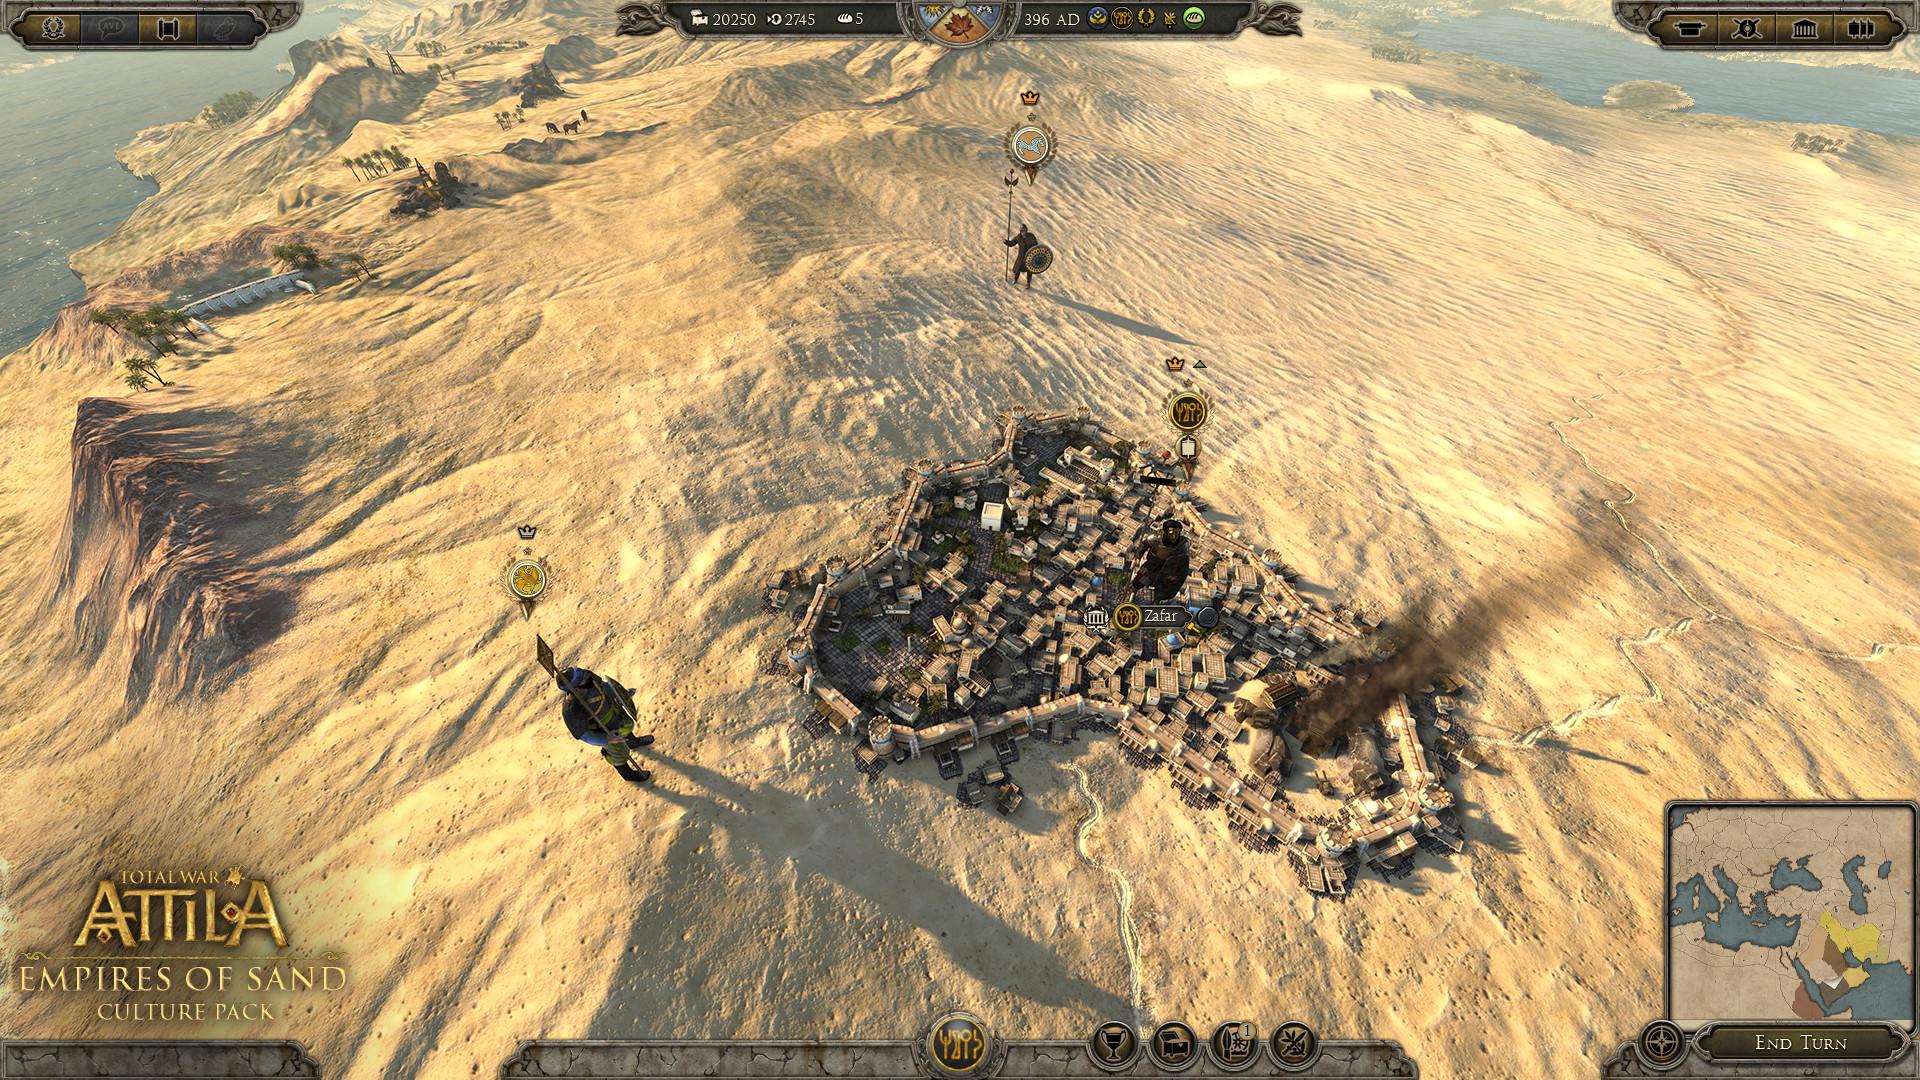 Total War: ATTILA - Empires of Sand Culture Pack PC Key Fiyatları